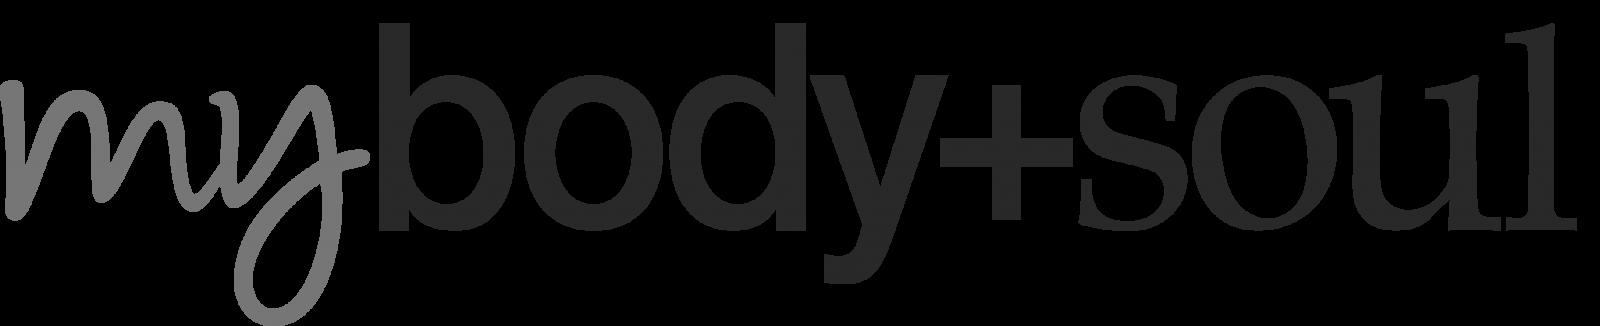 mybody_and_soul